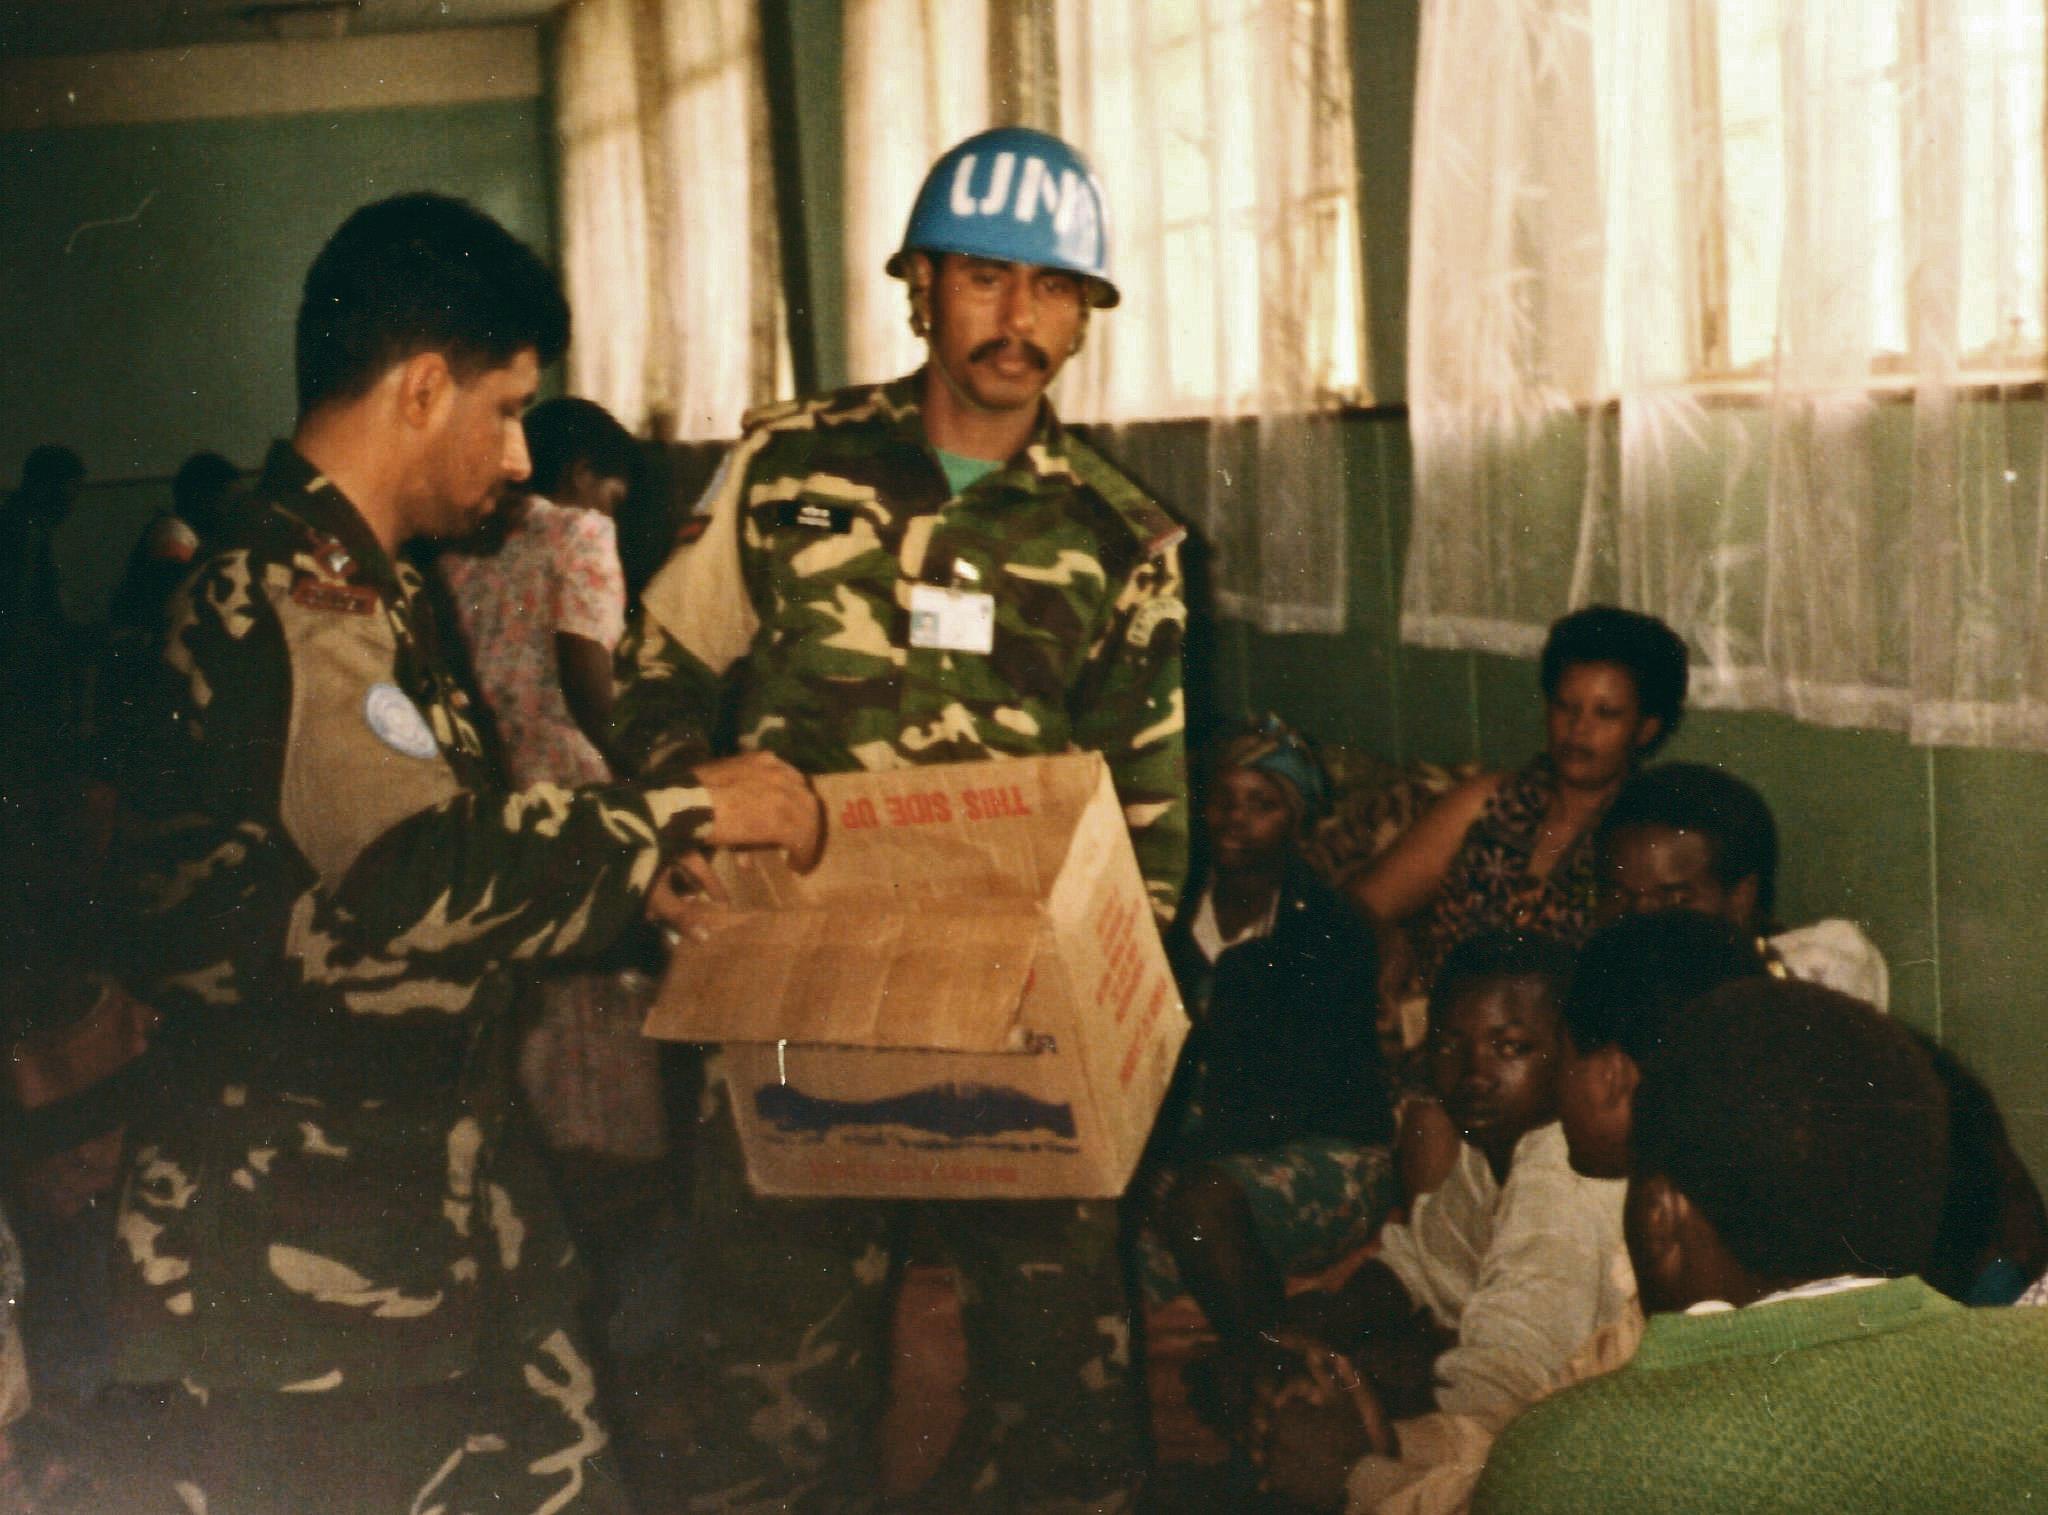 Providing supplies to Tutsi refugees - Amahoro Stadium, Kigali, April 1994